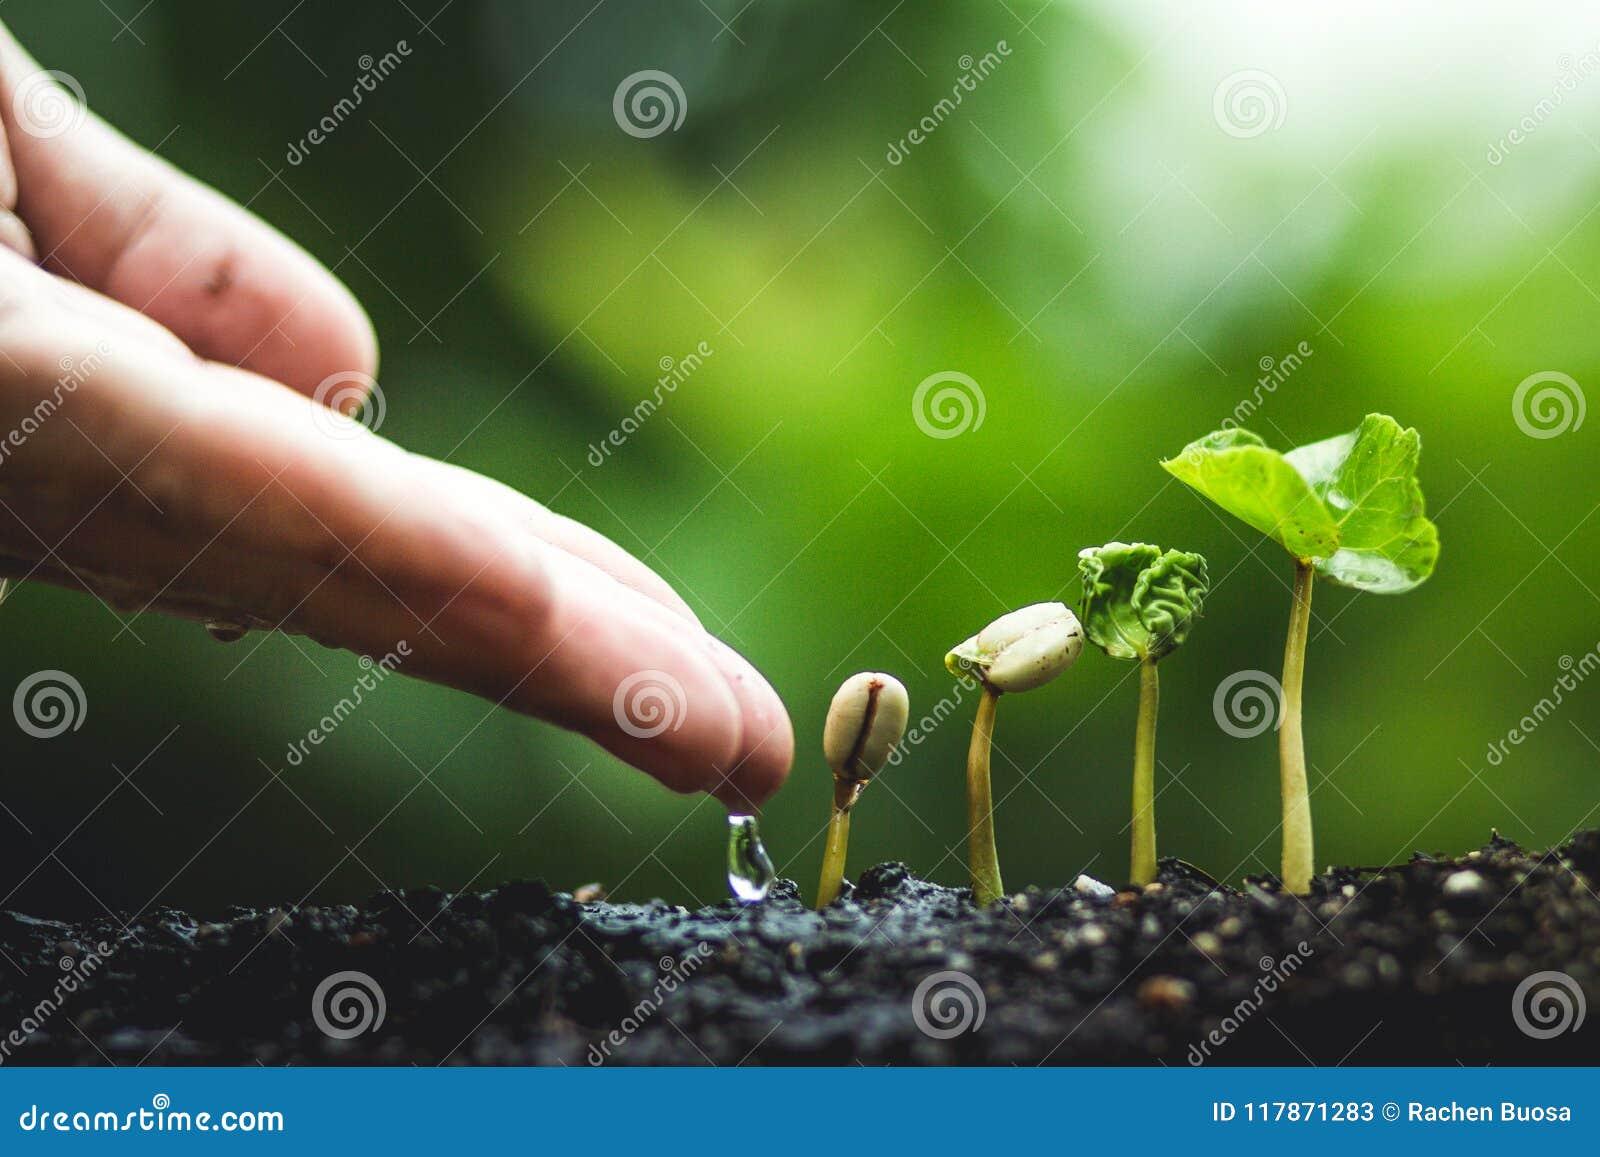 Coffee tree Growing Planting seeds In nature rainy season